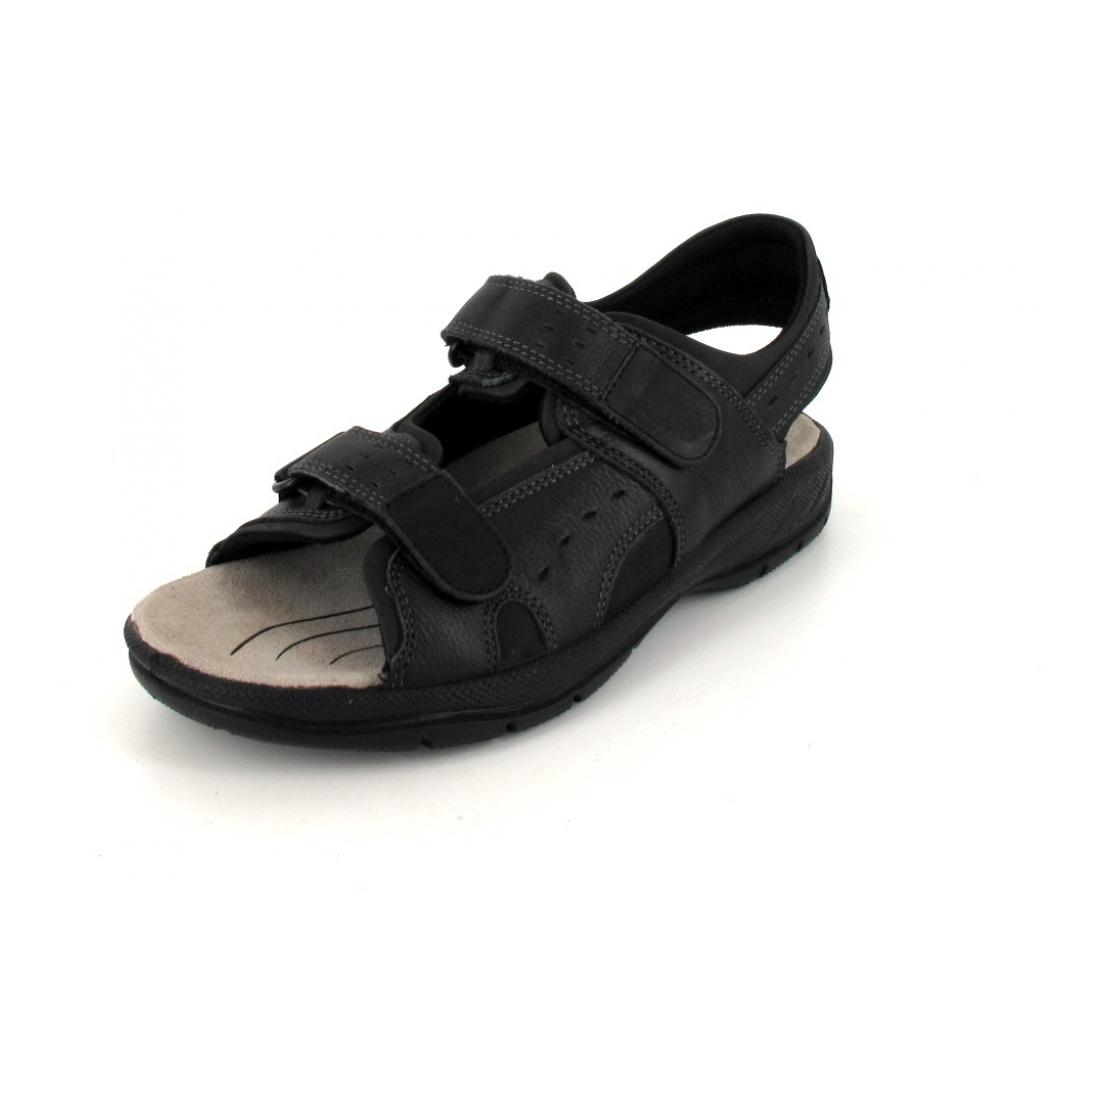 Jomos Sandale